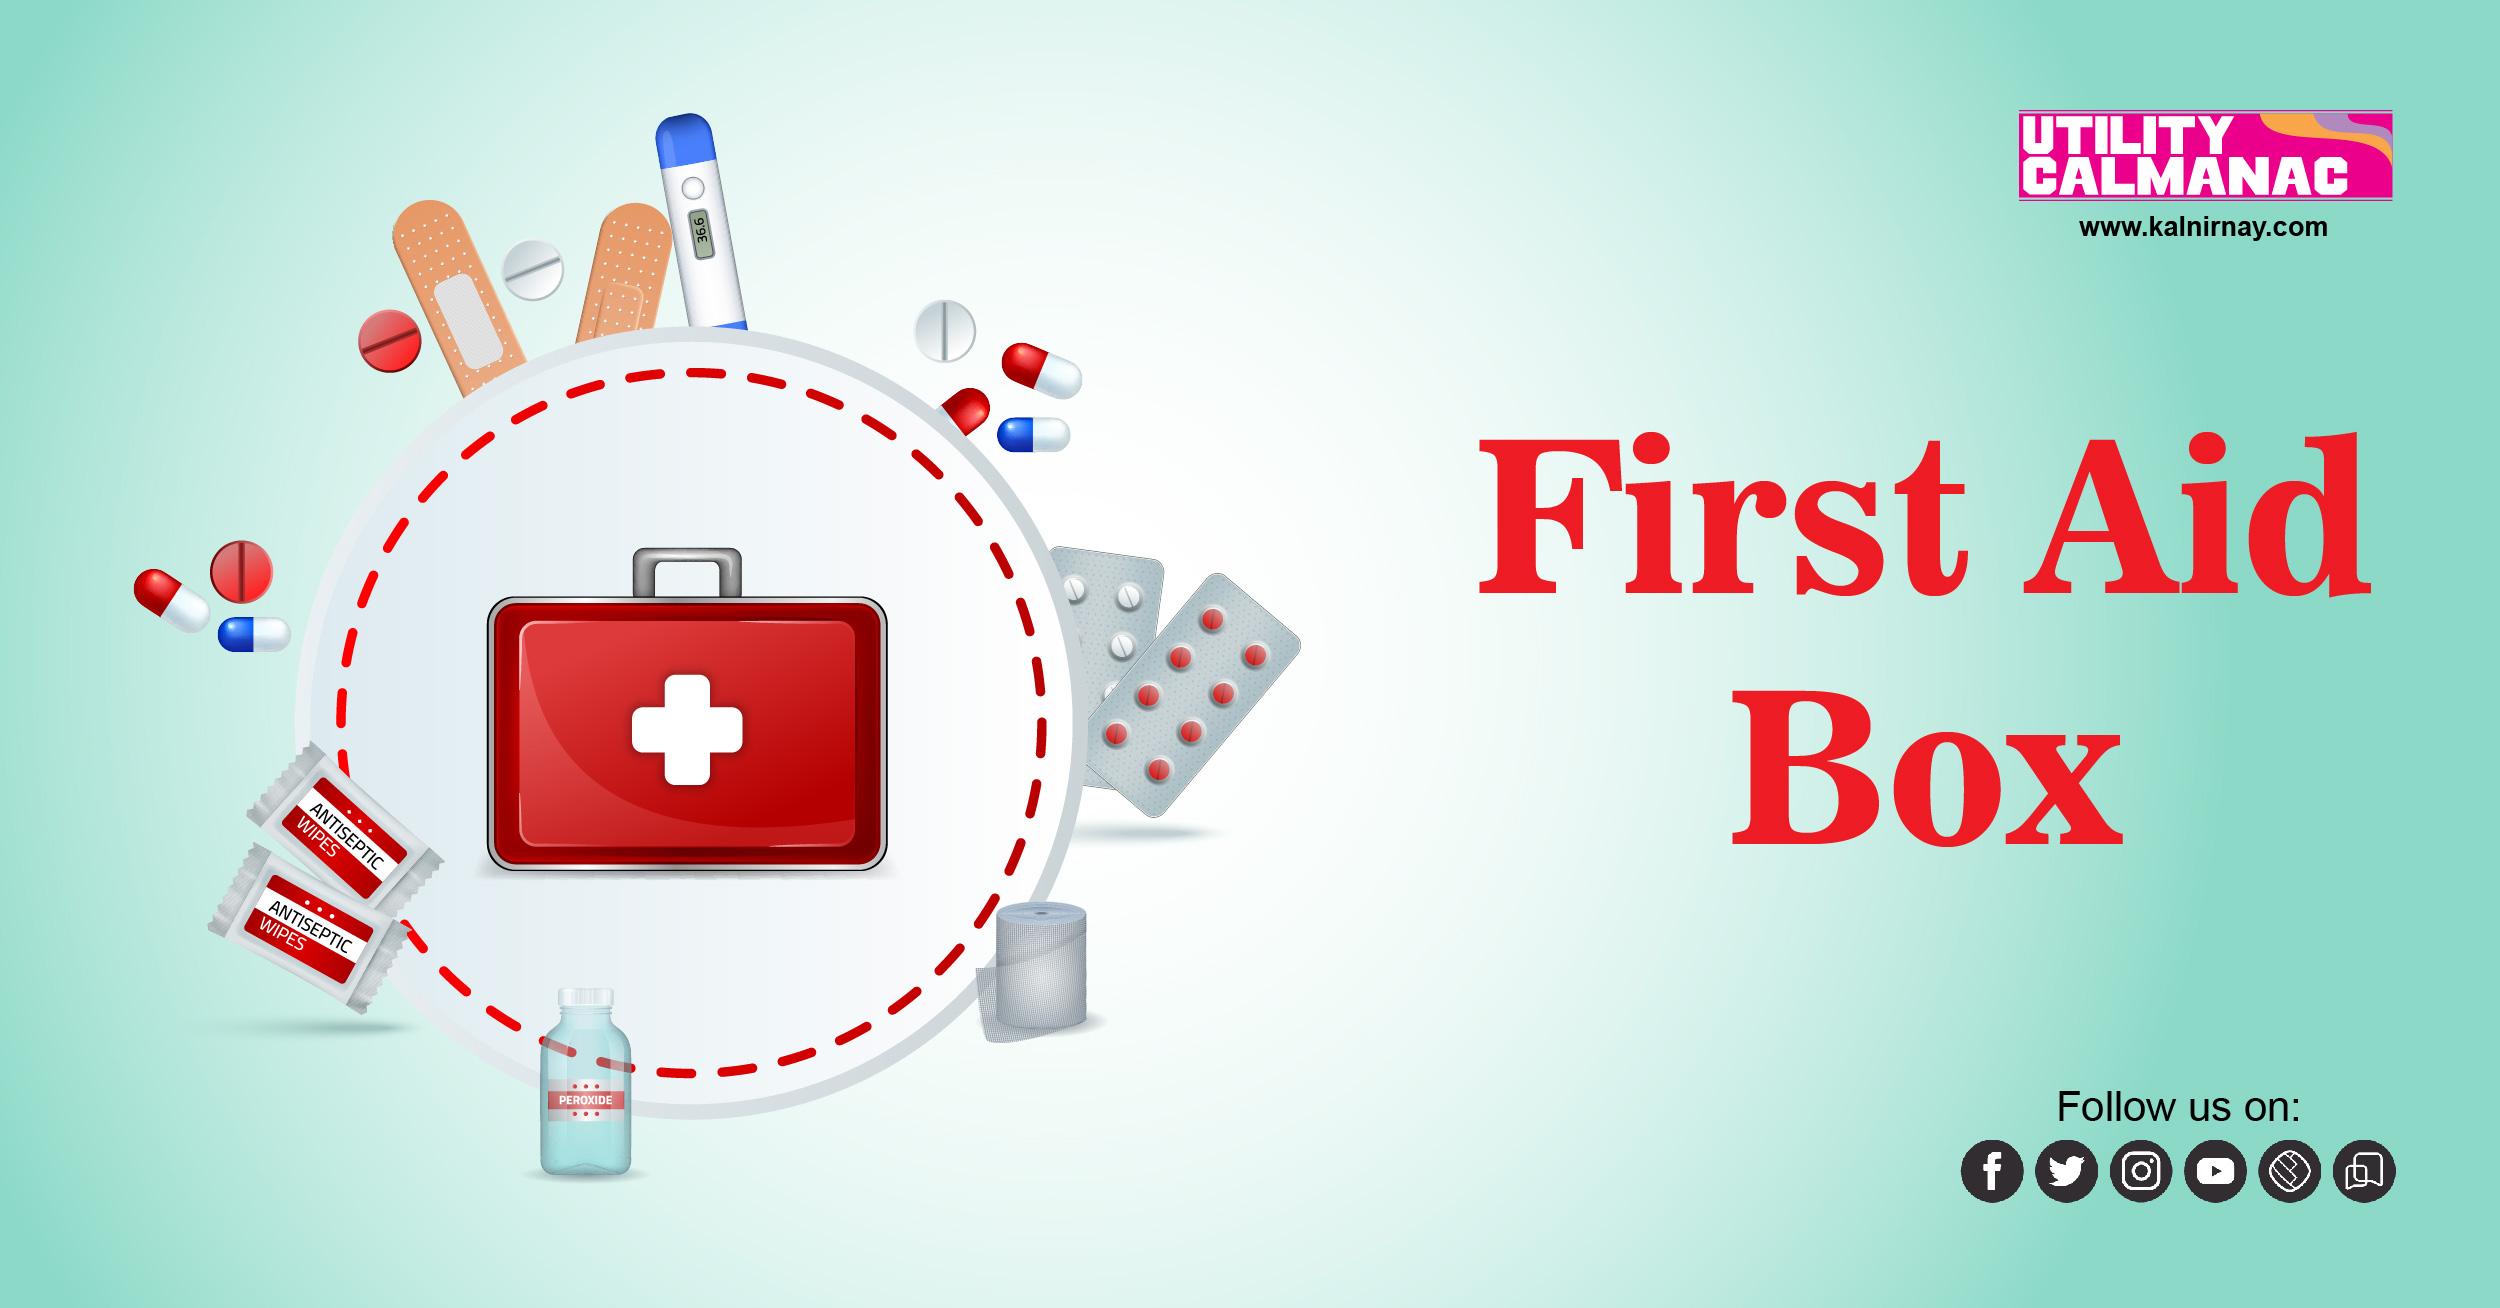 प्रथमोपचार पेटी | First Aid Box | First Aid Kit | Medical Kit | Aid Kit | Home First Aid Kit